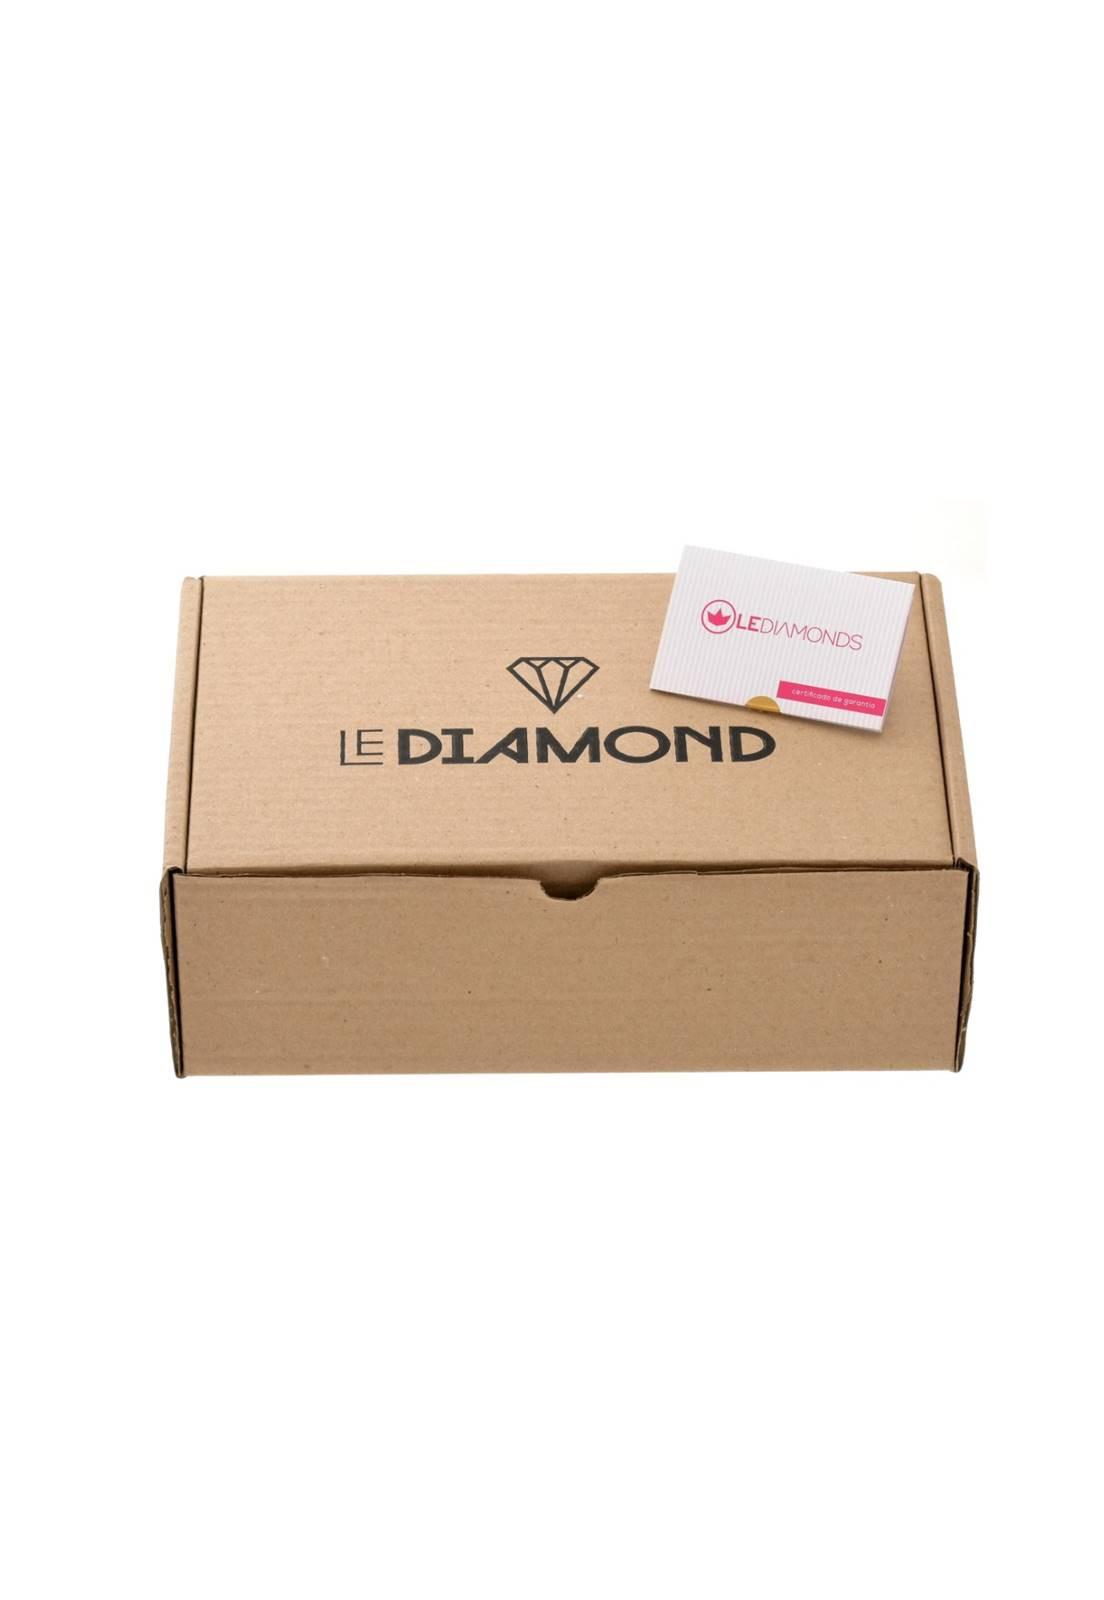 Brincos Le Diamond Triangulo Liso Dourado